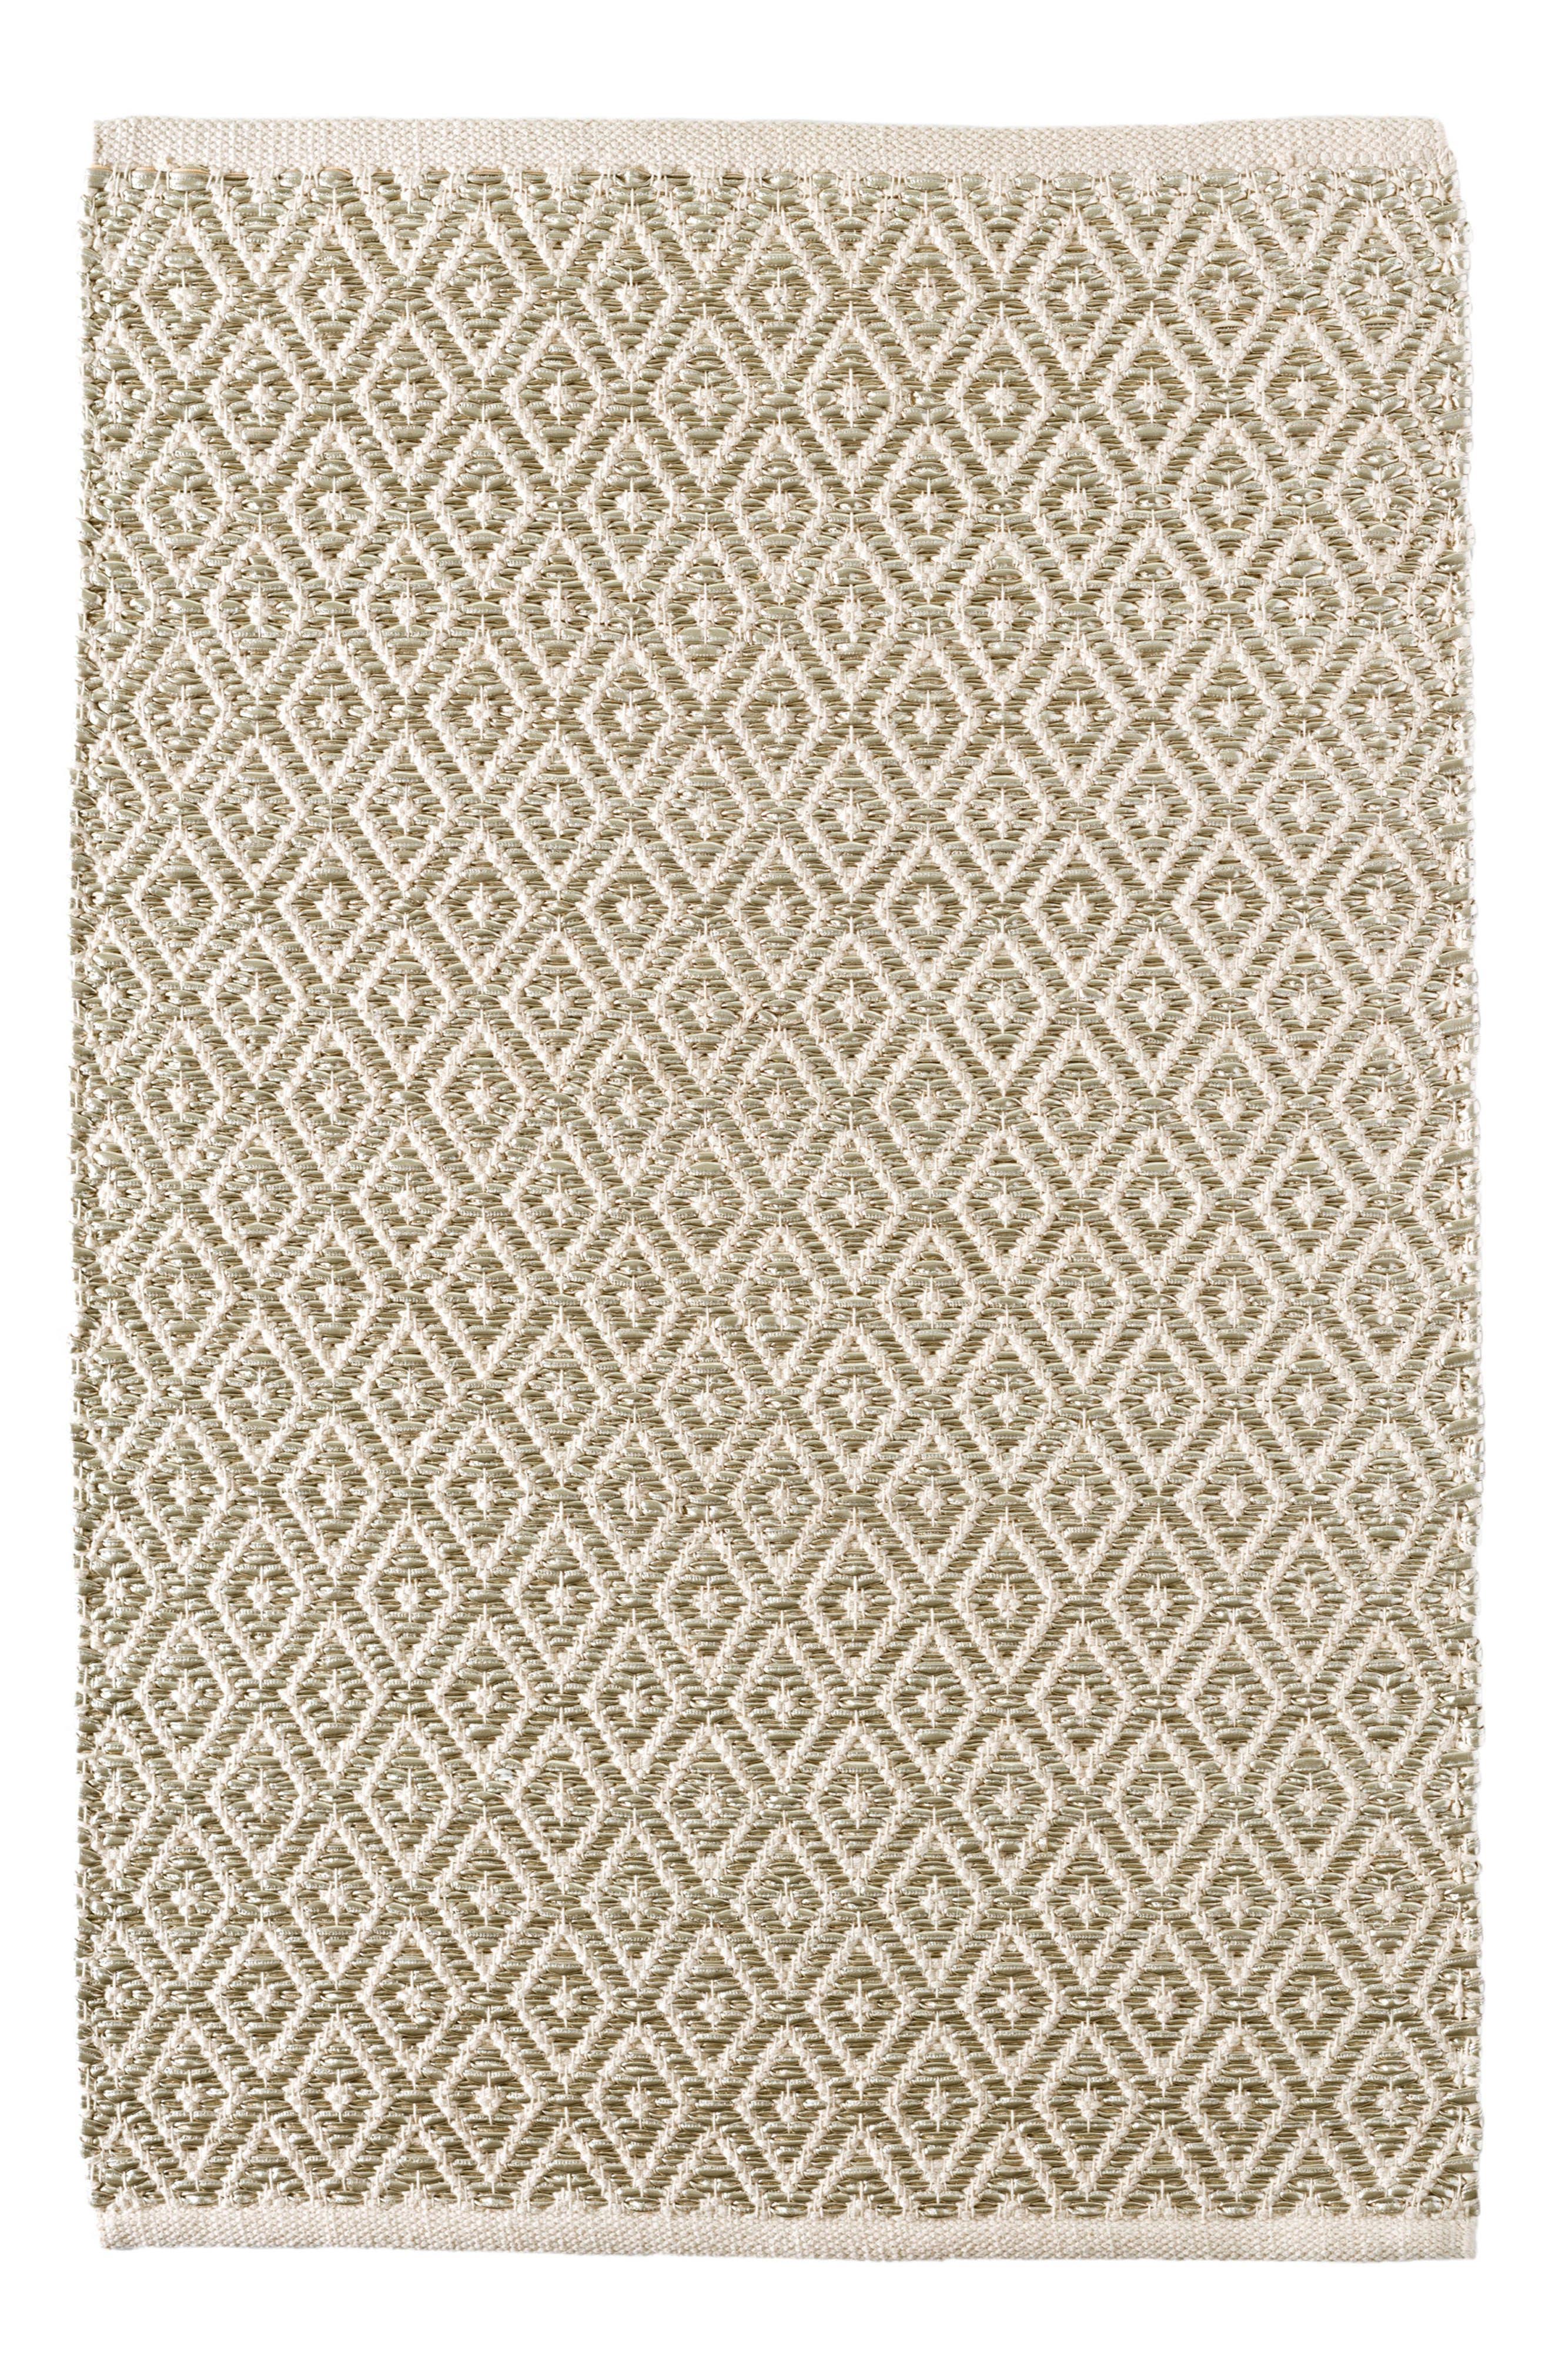 Glitter Diamond Woven Rug,                             Main thumbnail 1, color,                             Metallic